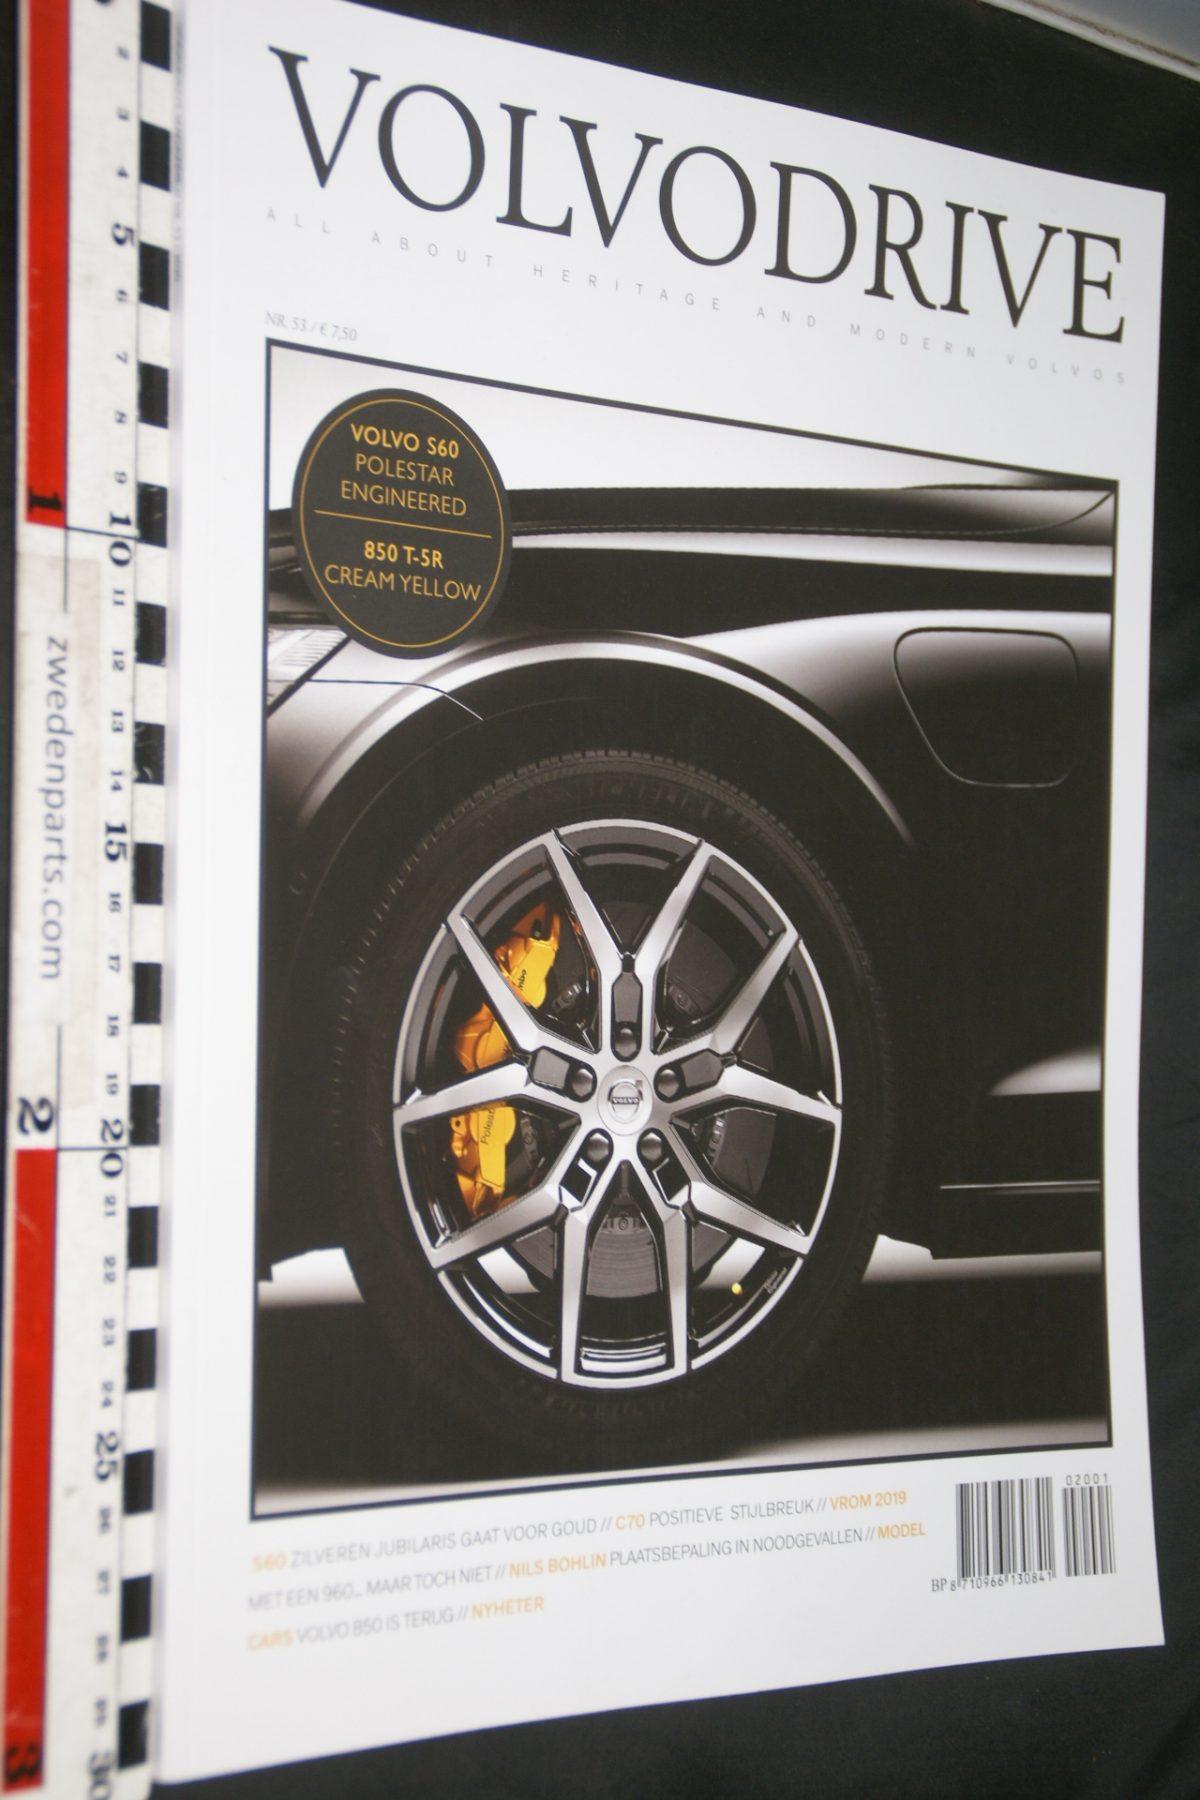 DSC05091 2020 tijdschrift Volvodrive nr 53